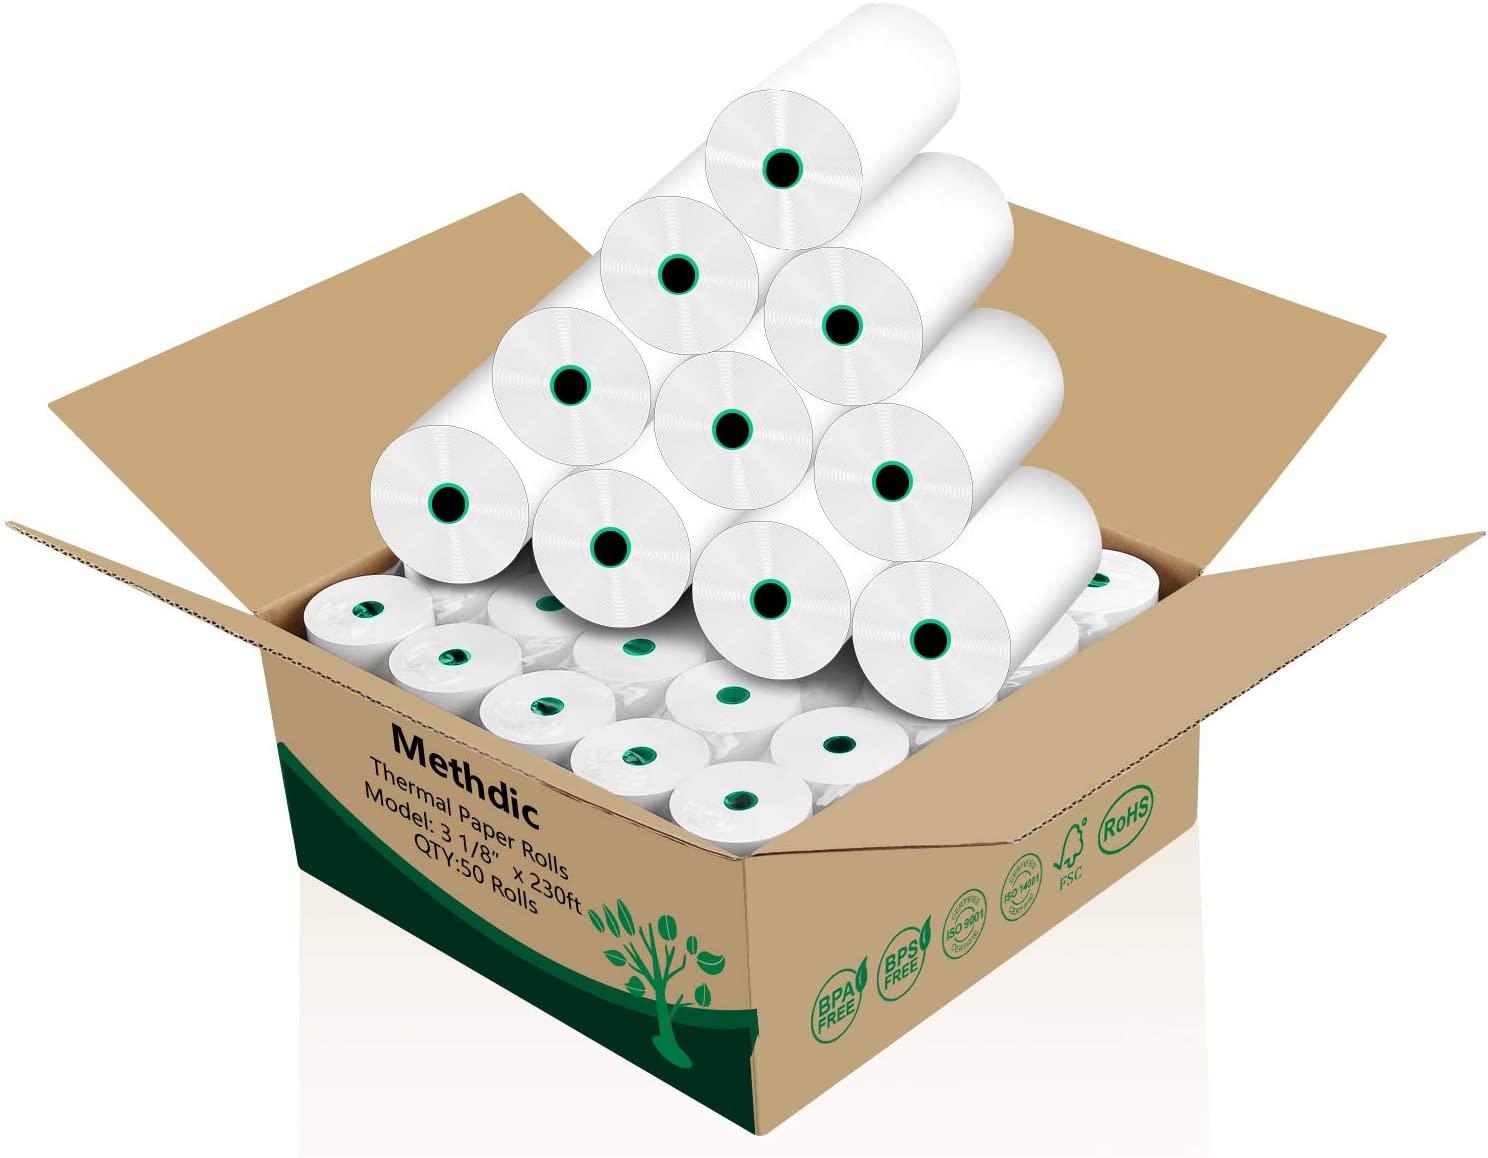 Methdic BPA BPS free Thermal Receipt Paper Rolls 3-1/8 x 230ft 50 Rolls